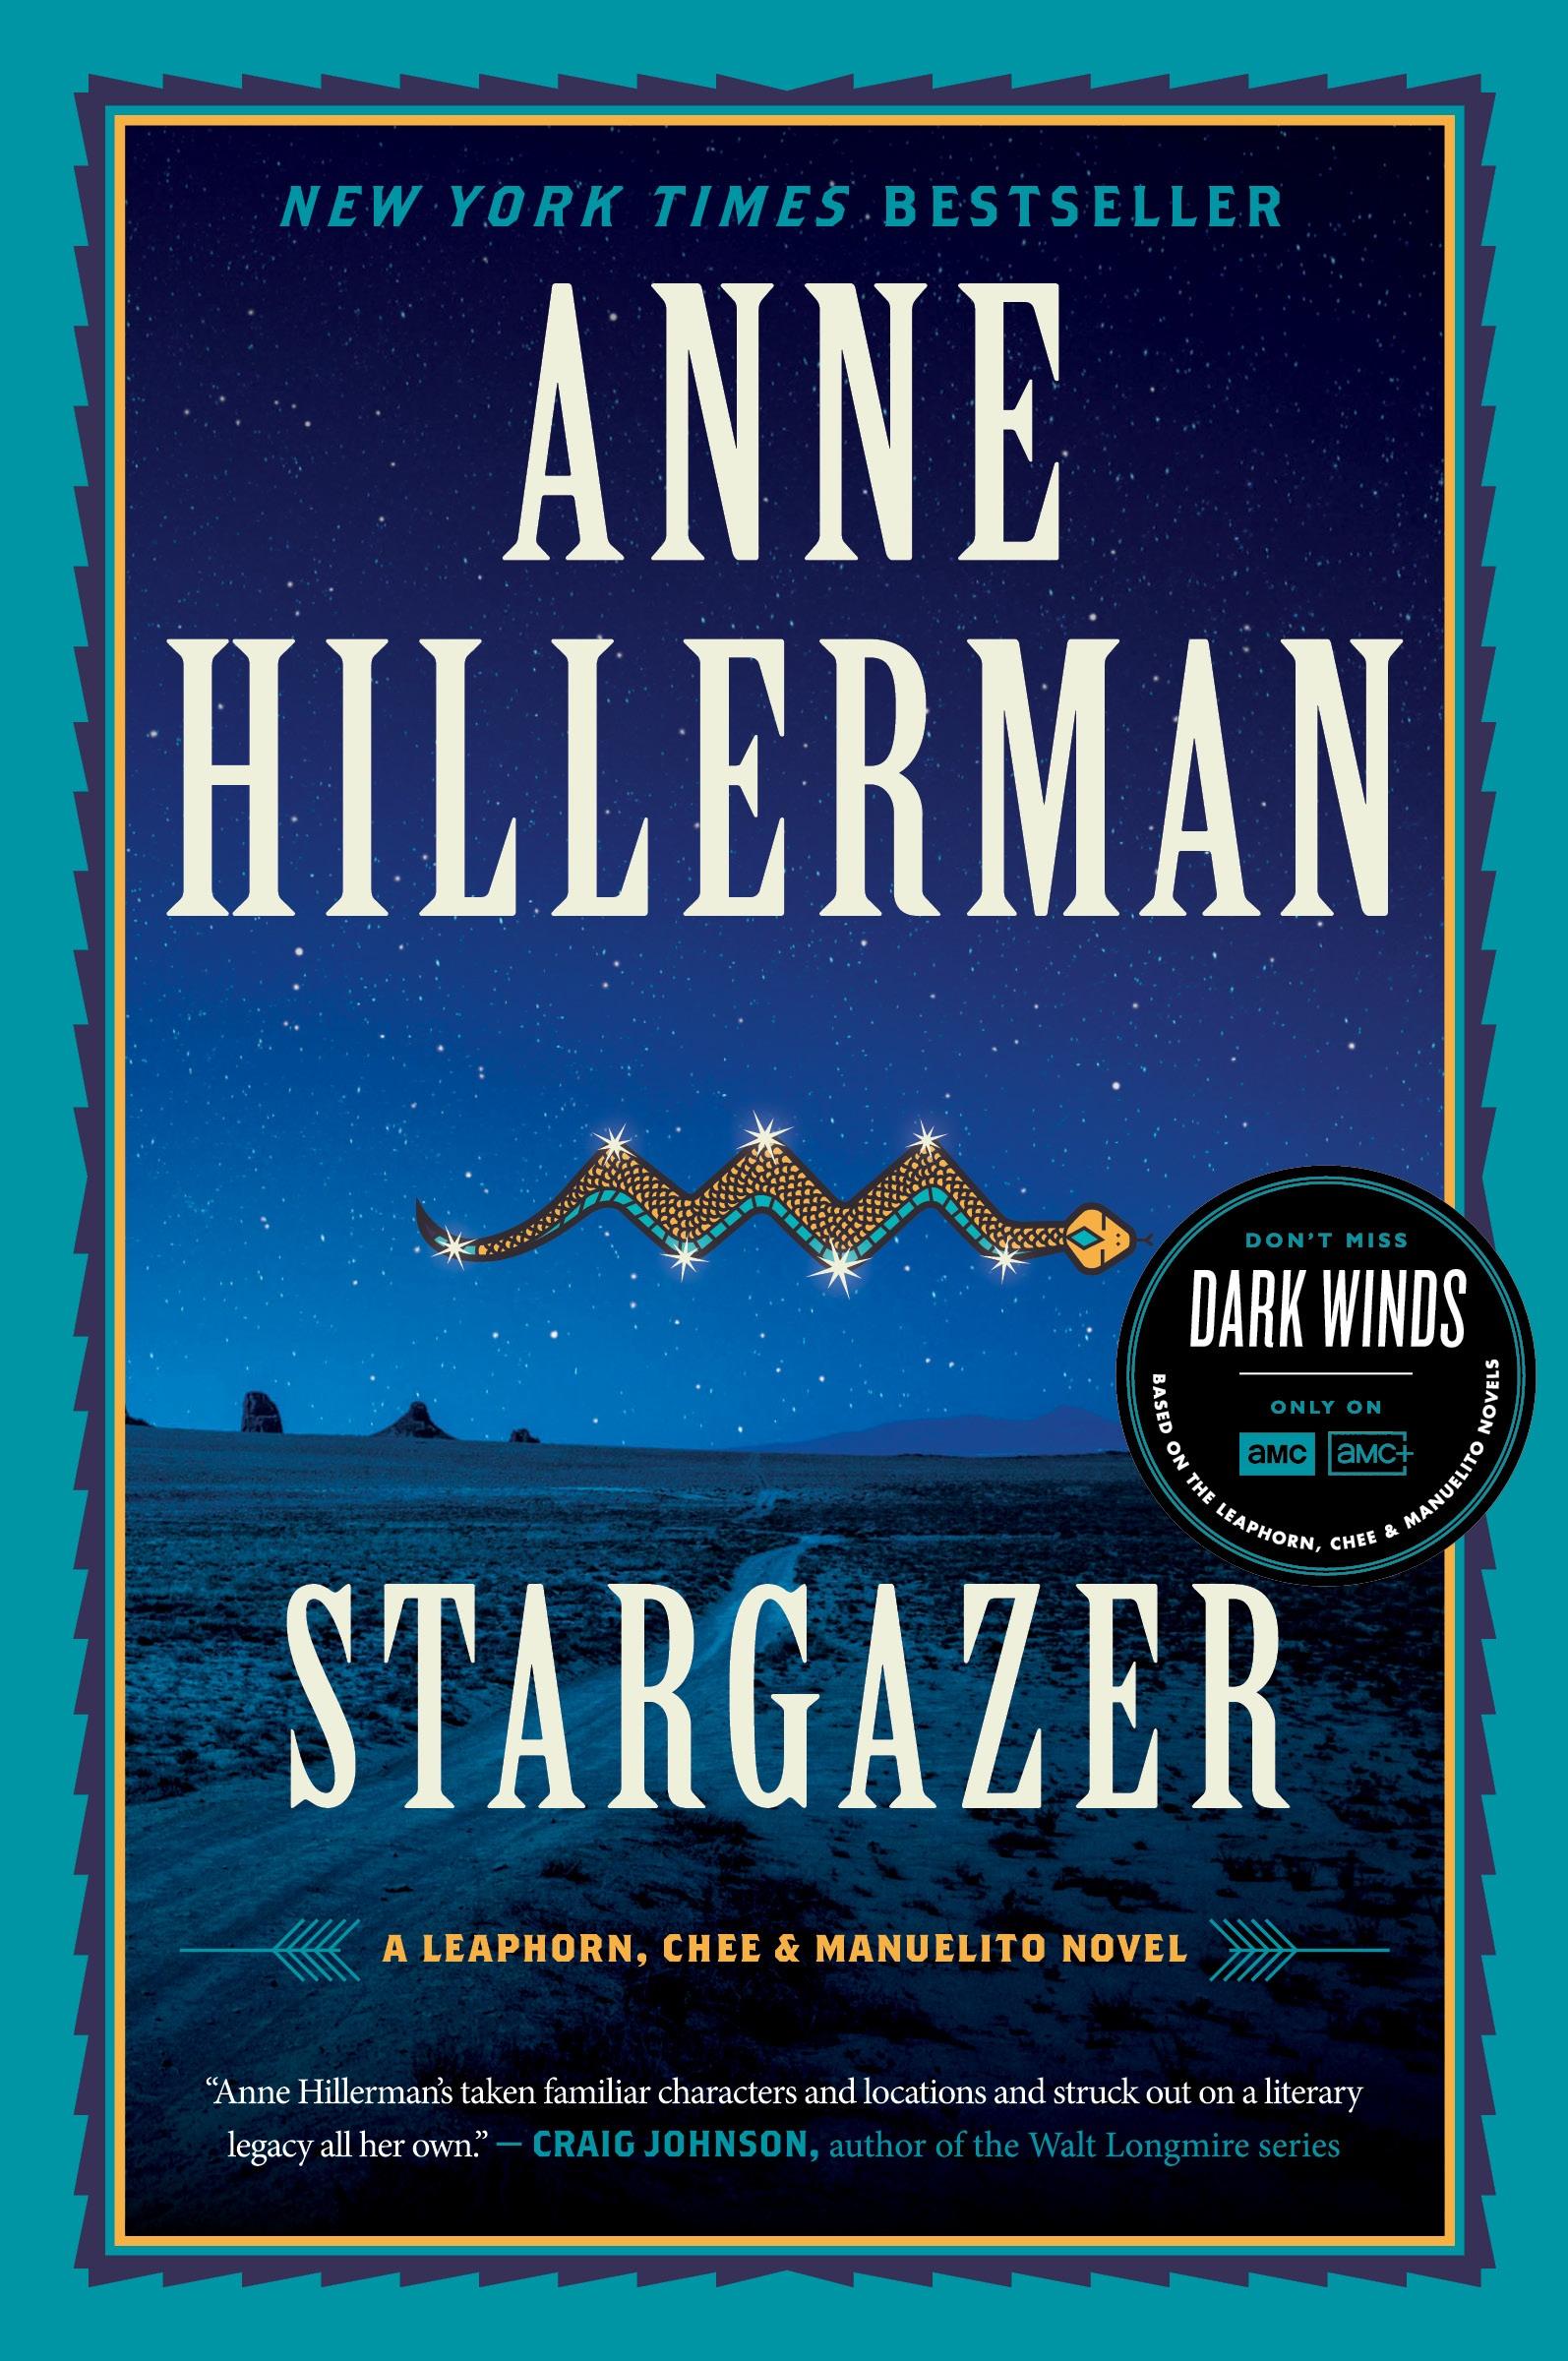 Stargazer A Leaphorn, Chee & Manuelito Novel